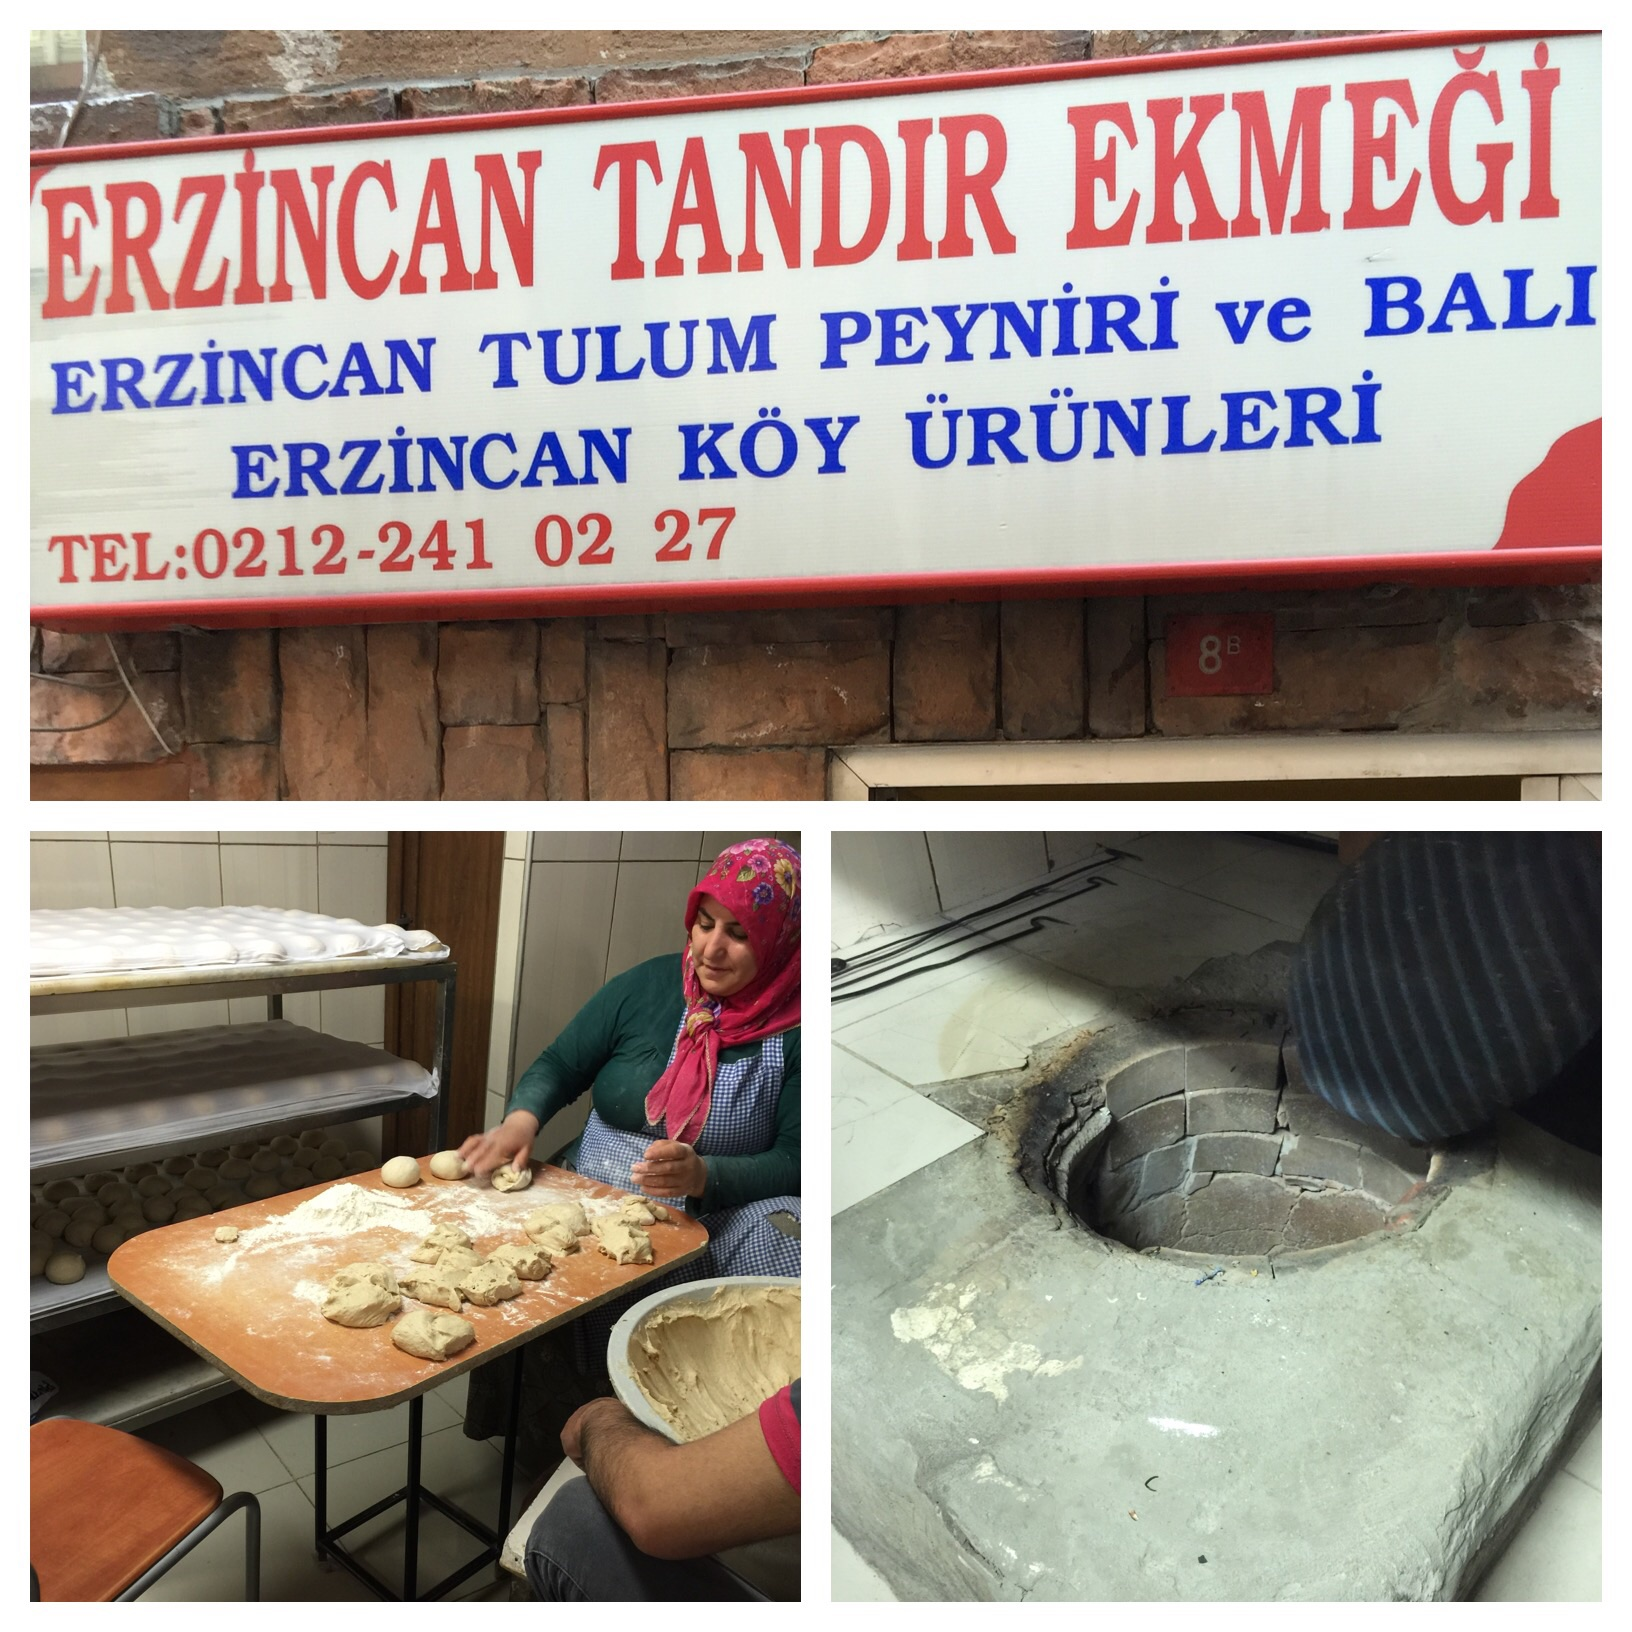 Fresh artisanal tandir bread